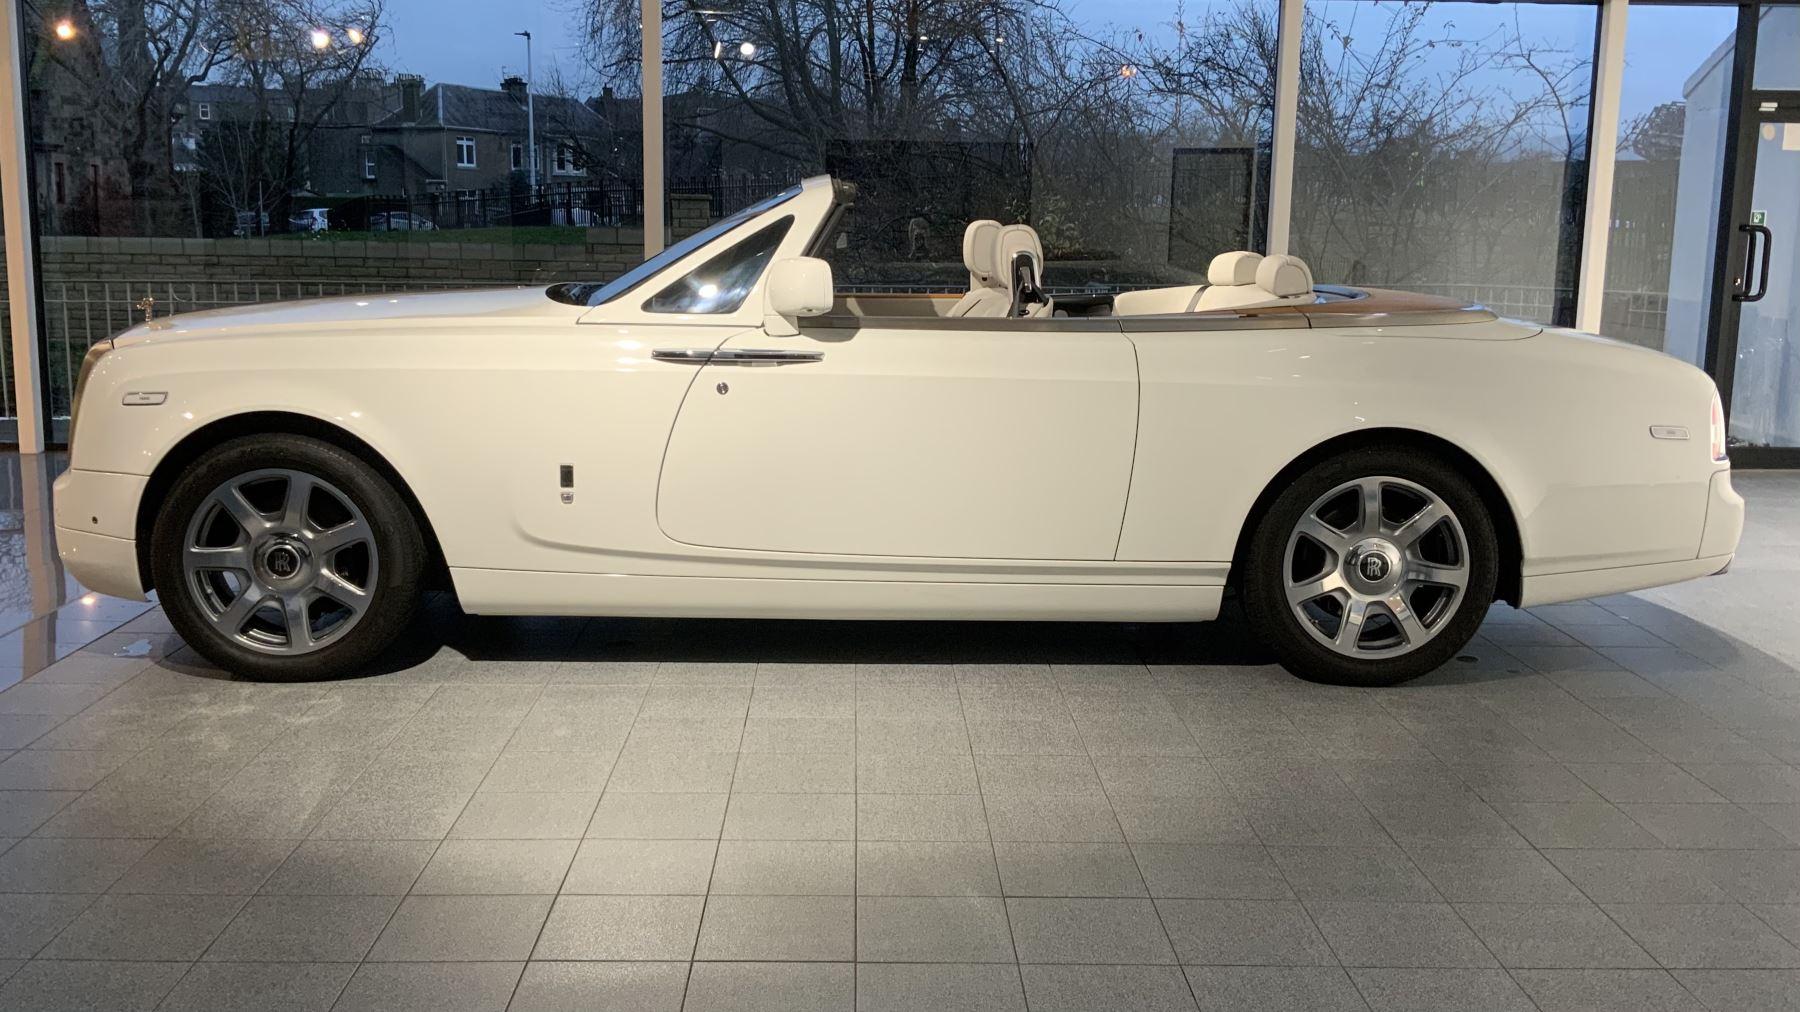 Rolls-Royce Phantom Drophead Coupe Series 2 image 1